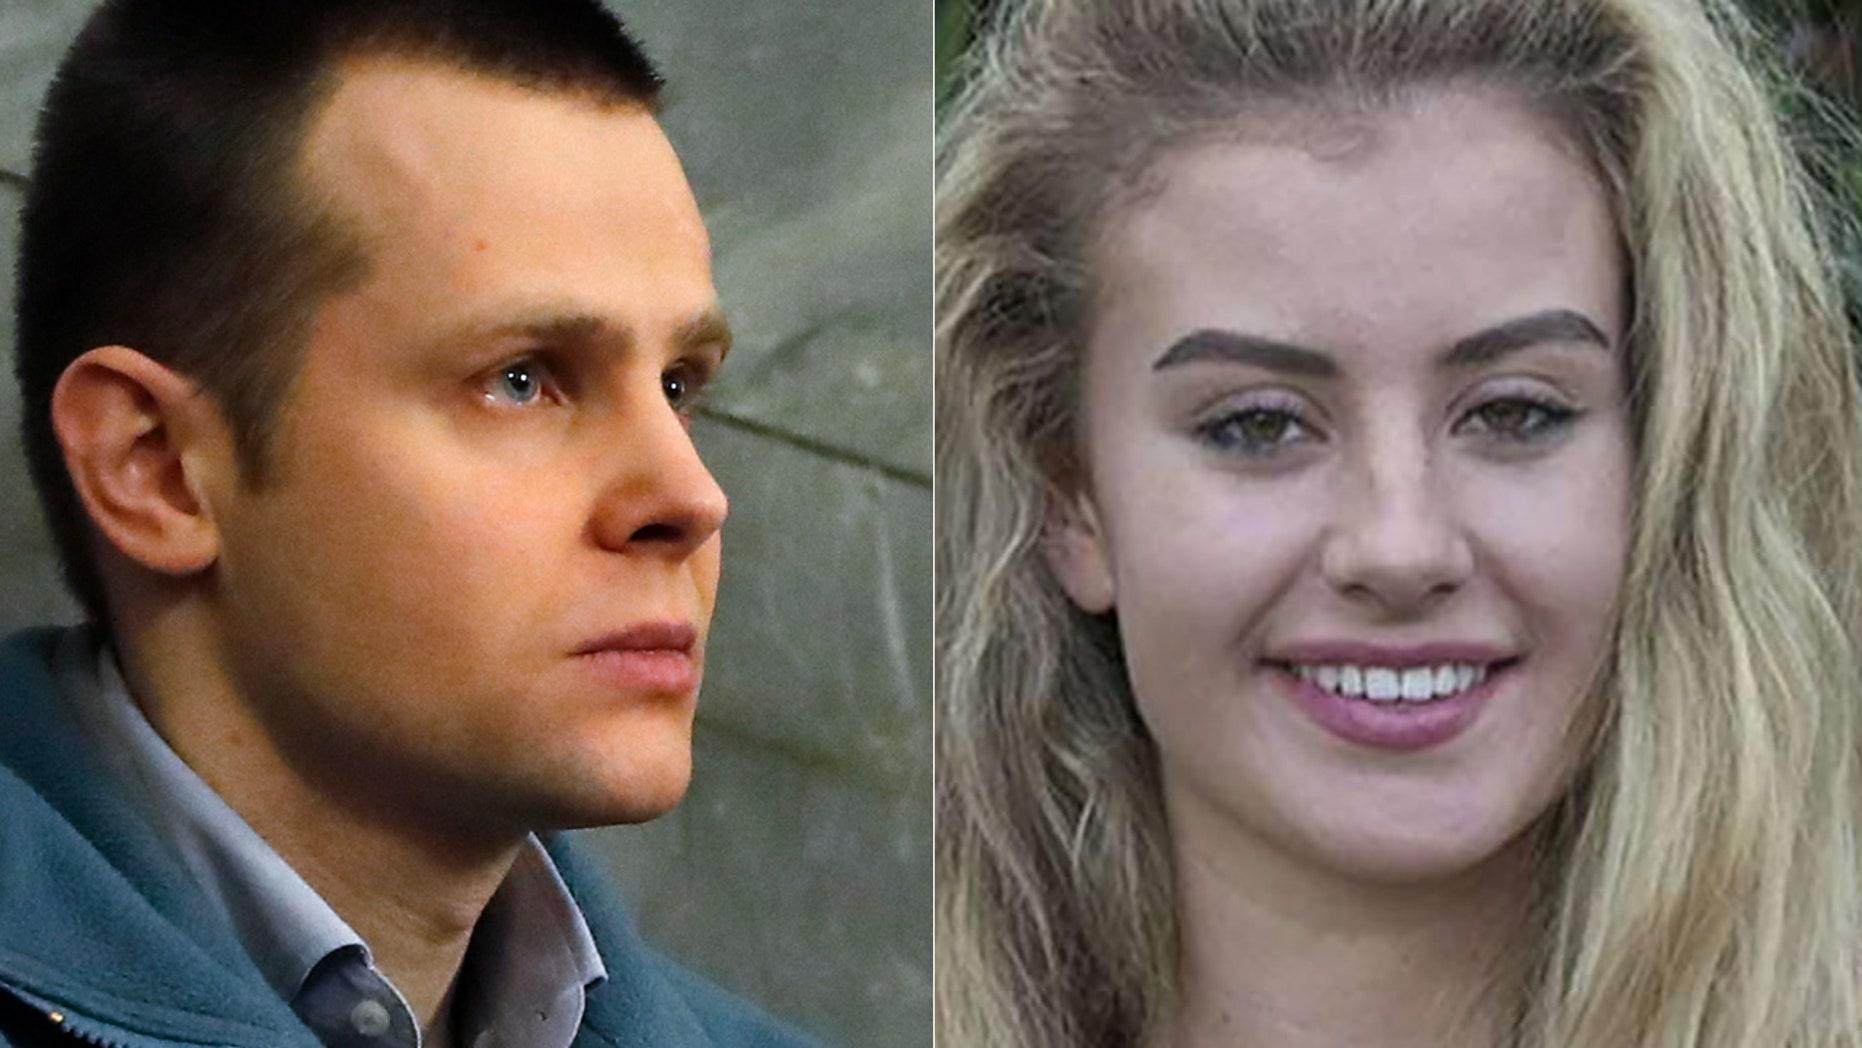 Lukasz Herba was sentenced for kidnapping Chloe Ayling.